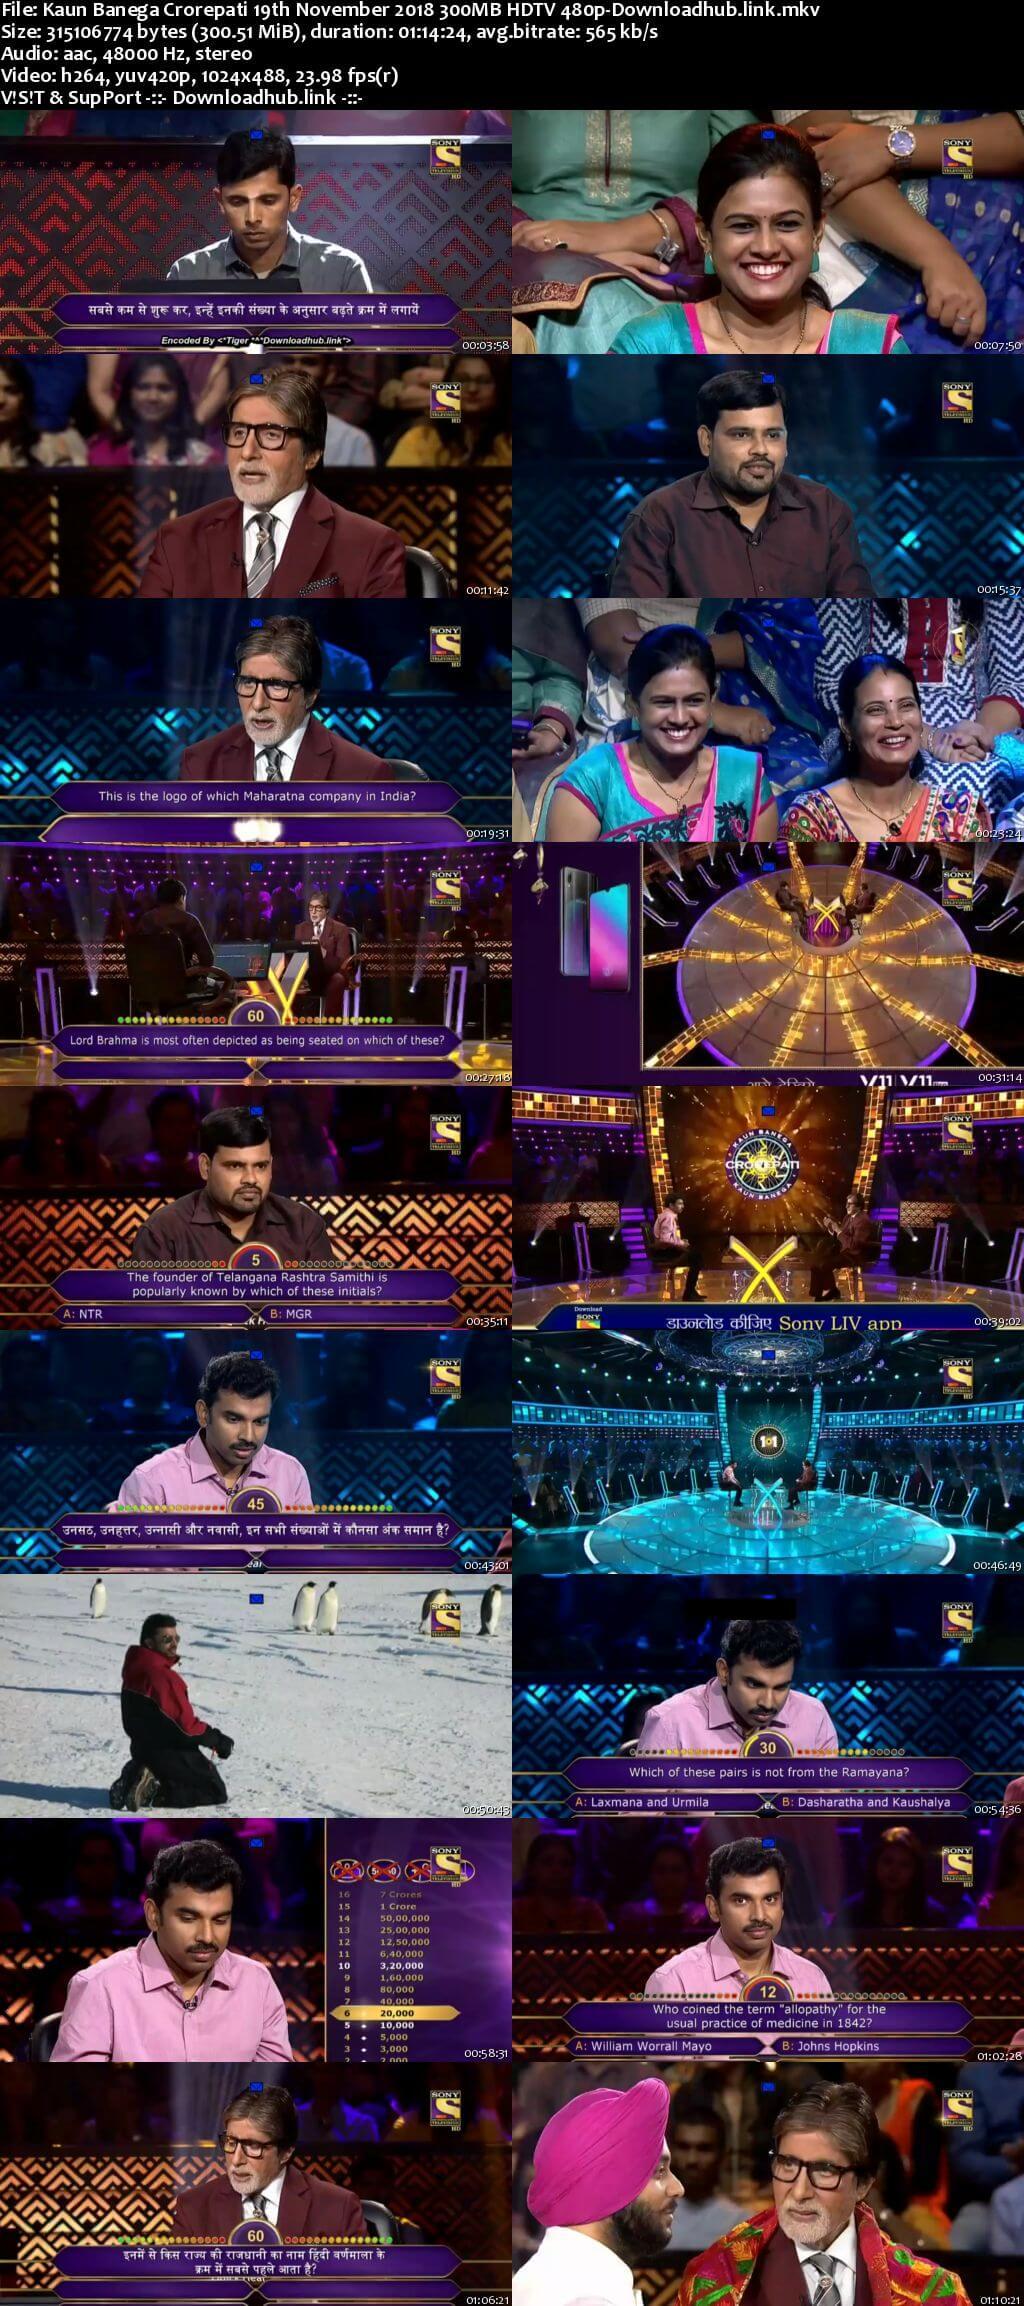 Kaun Banega Crorepati 19th November 2018 300MB HDTV 480p